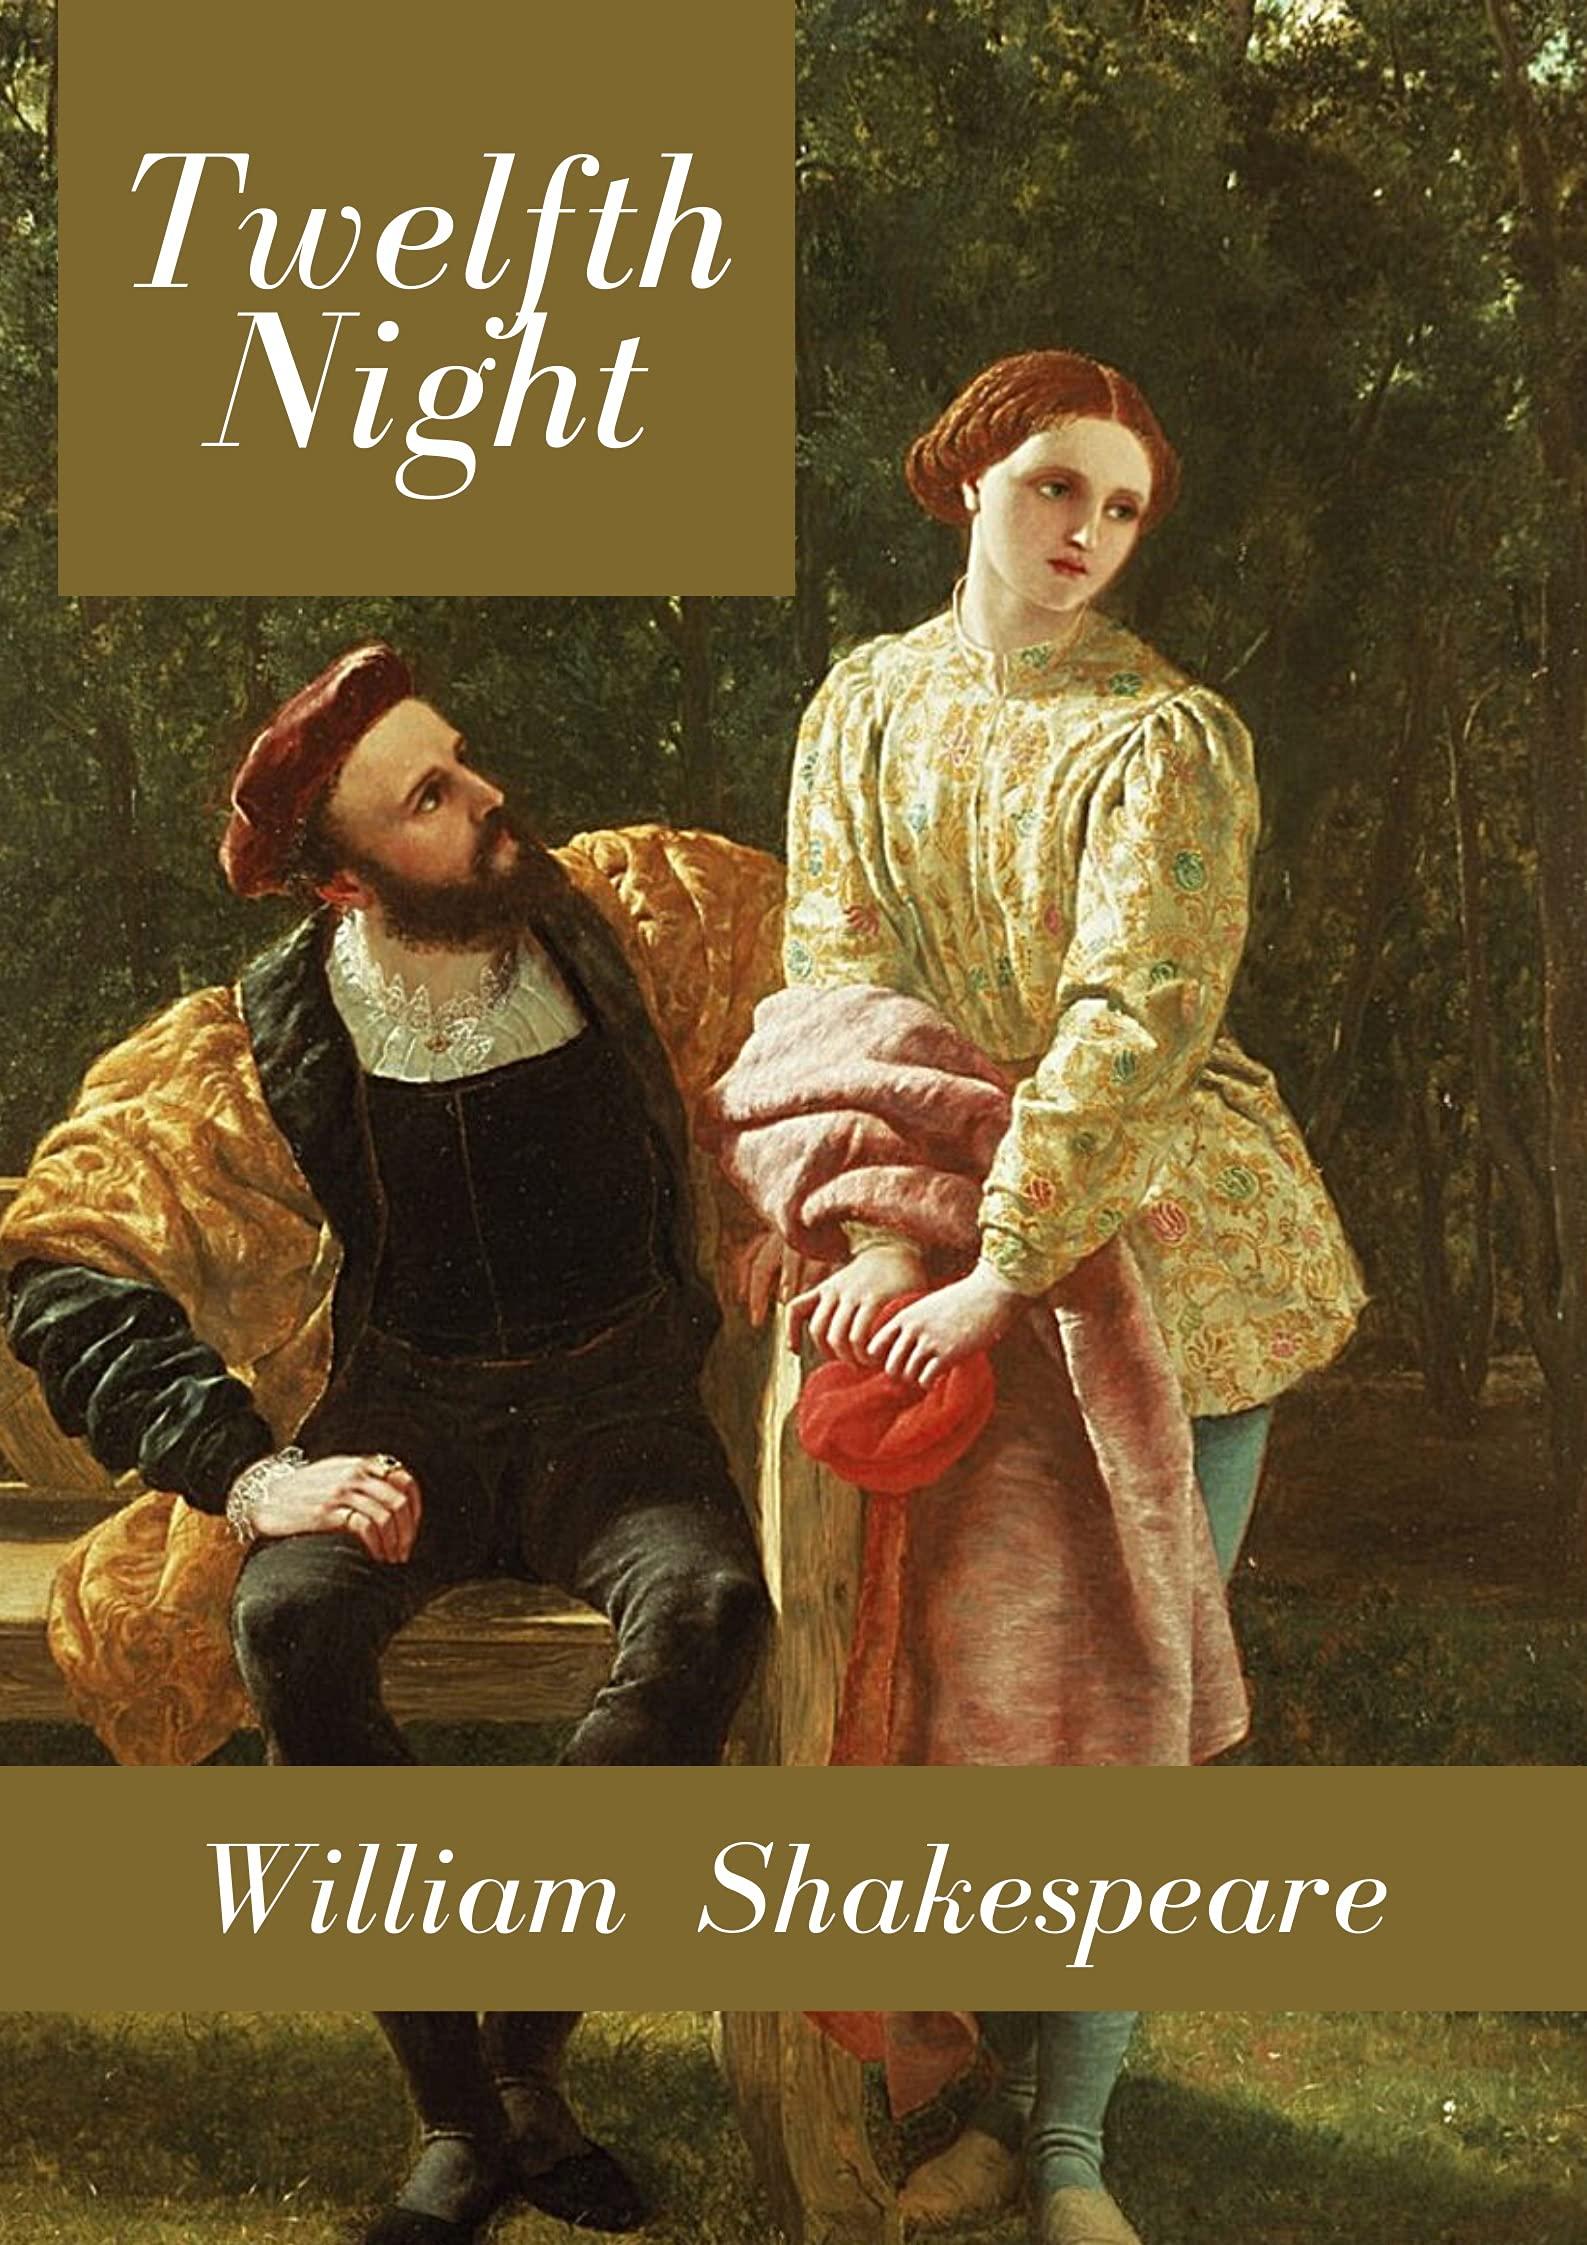 """Twelfth Night "": William Shakespeare (Non Fiction Twelfth Night William Shakespeare Drama,Plays Poetry Literature) [Annotated]"